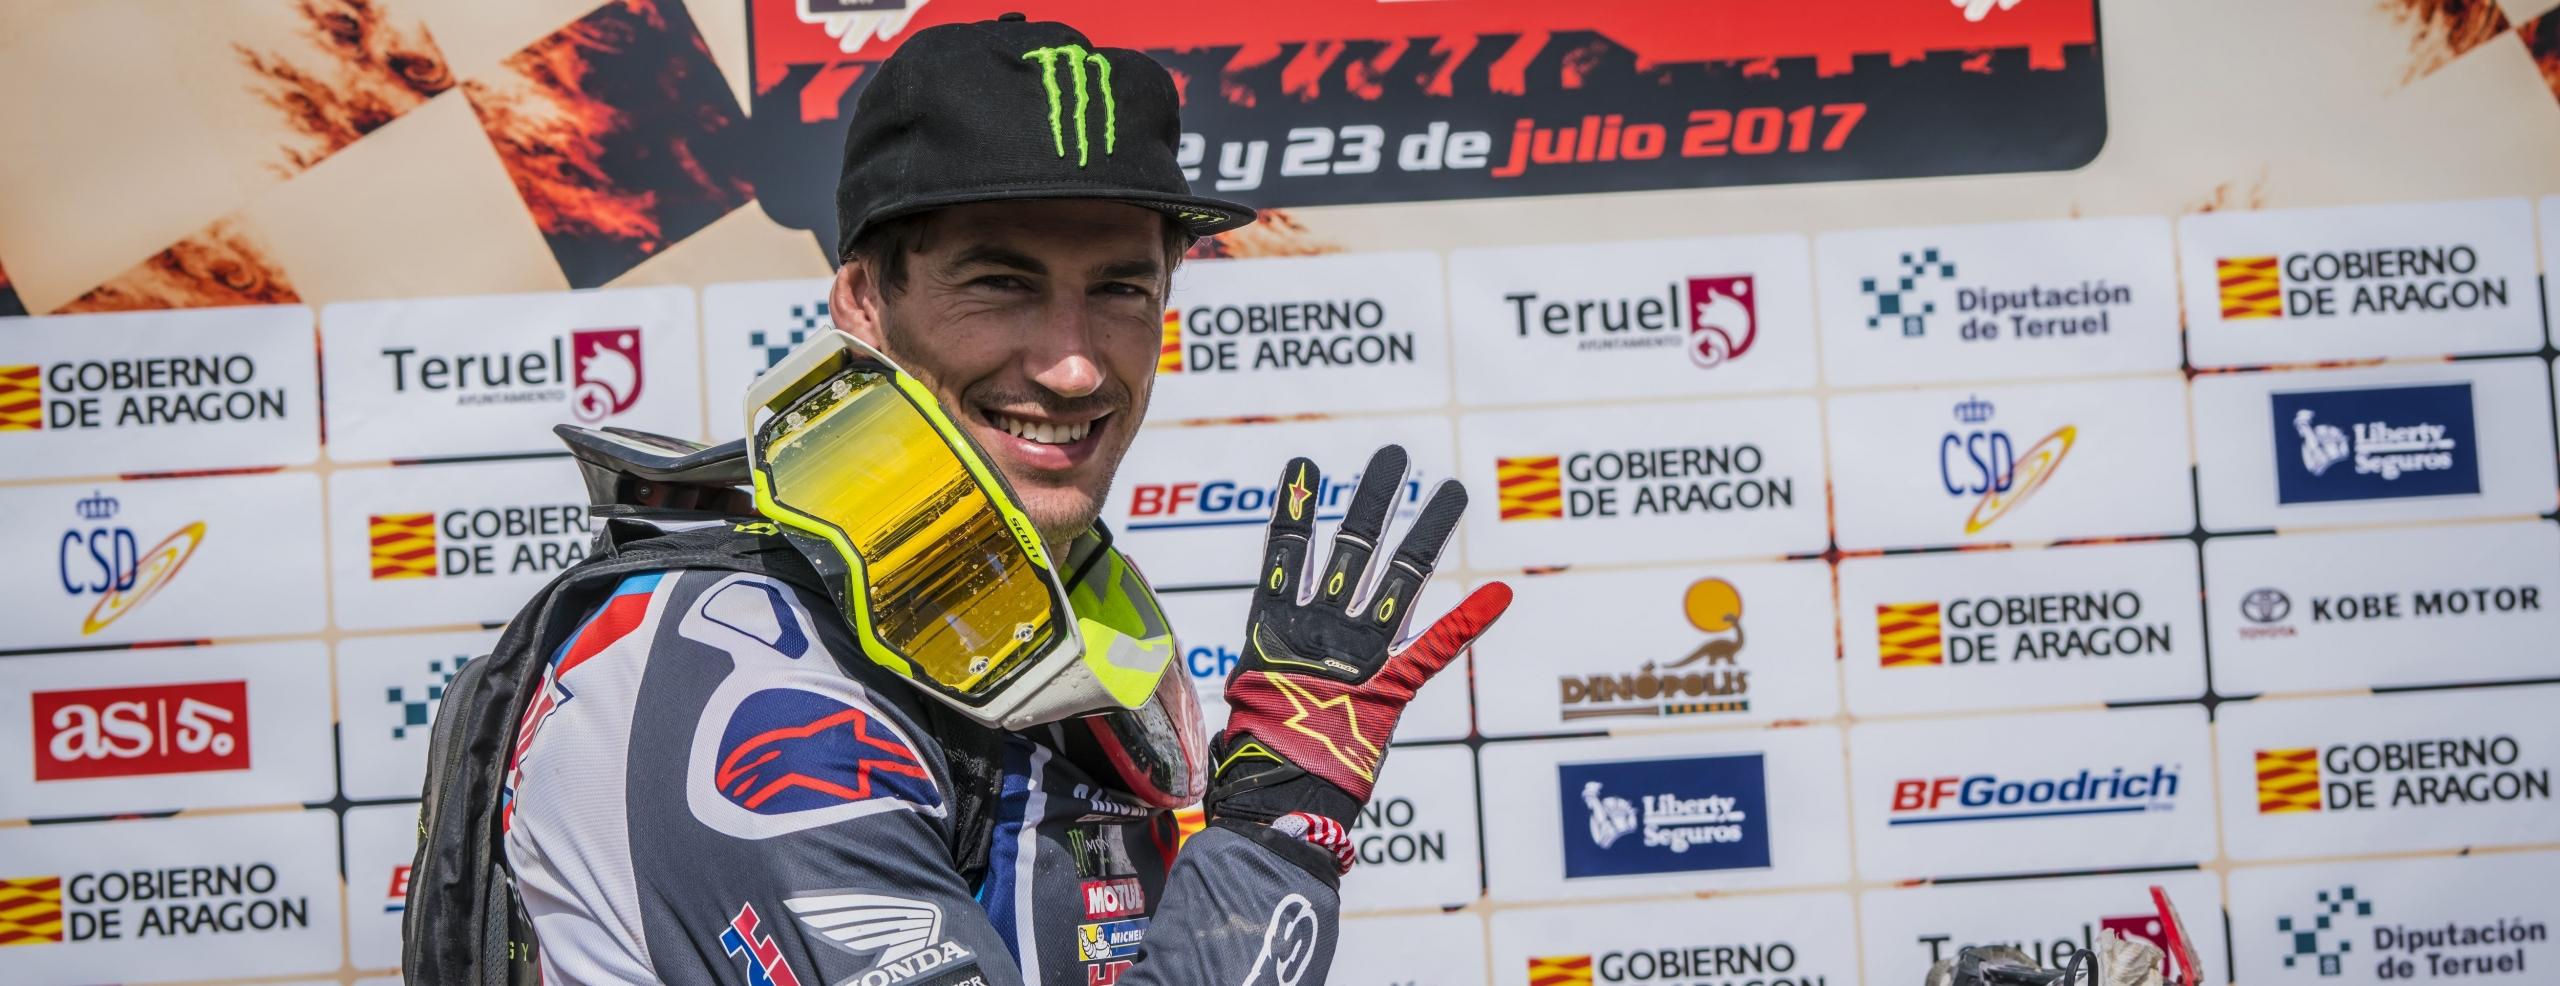 Joan Barreda wins the Baja Aragon 2017